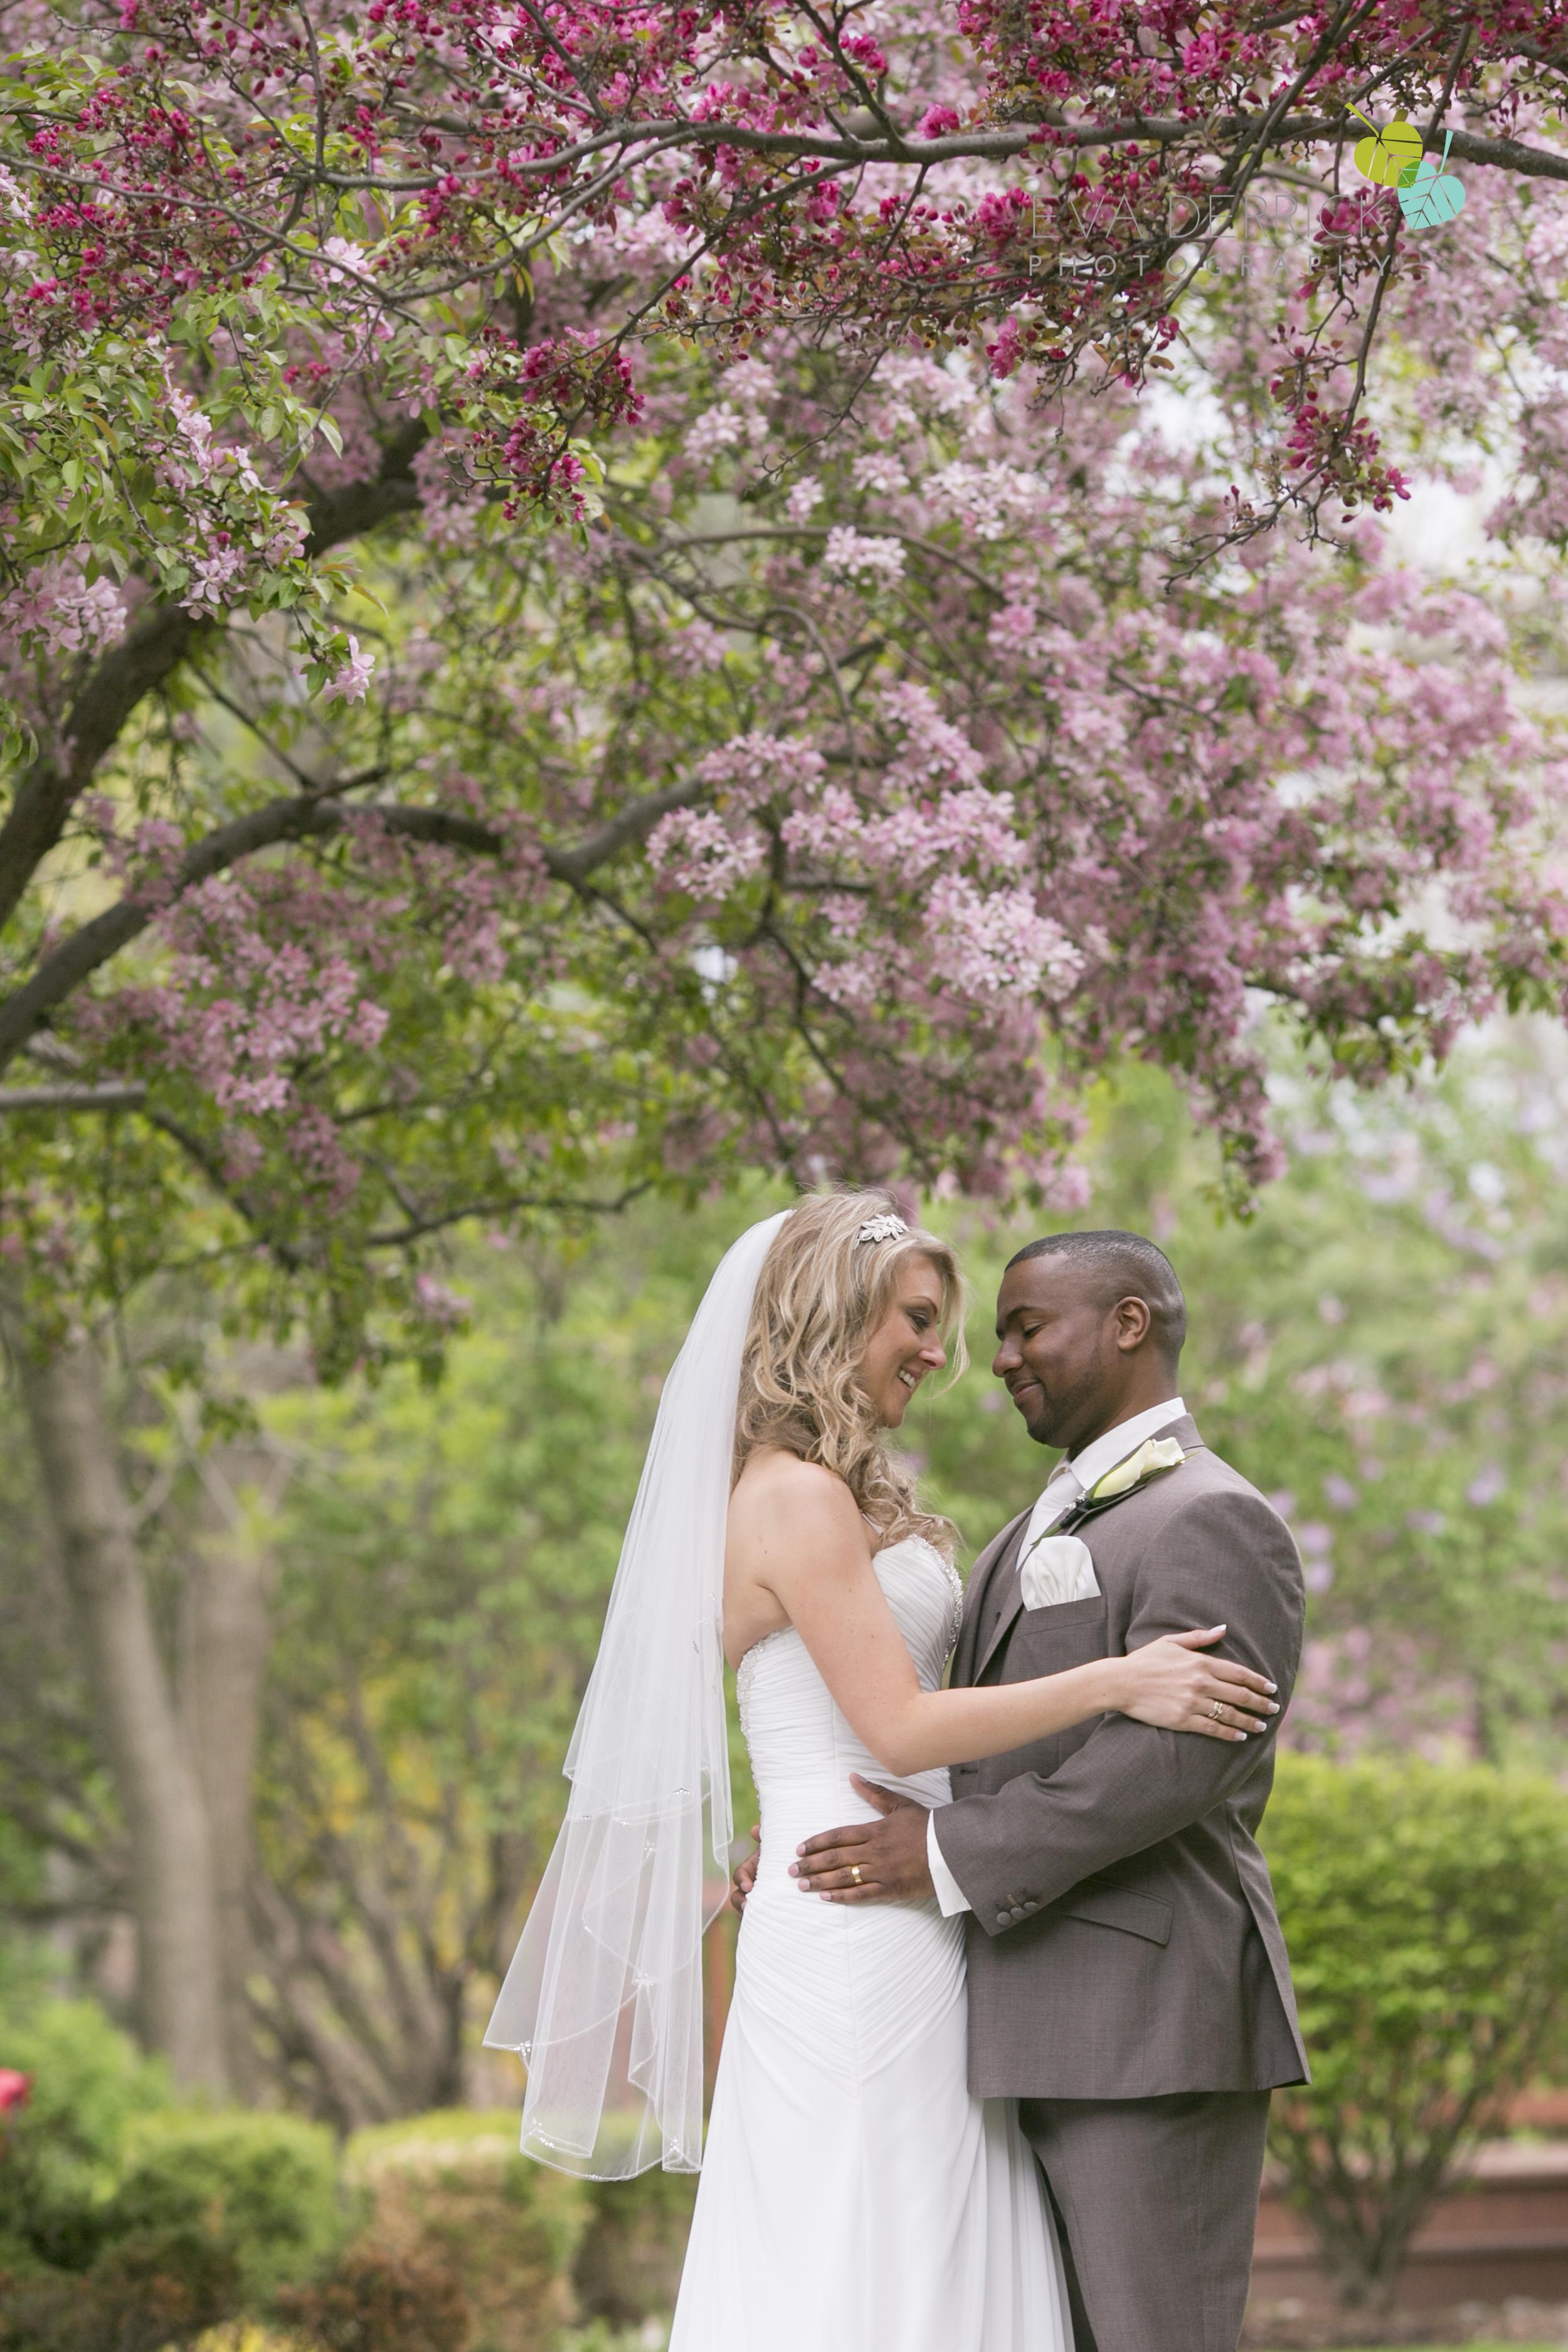 edp_wedding_jenna_chris-0260.jpg